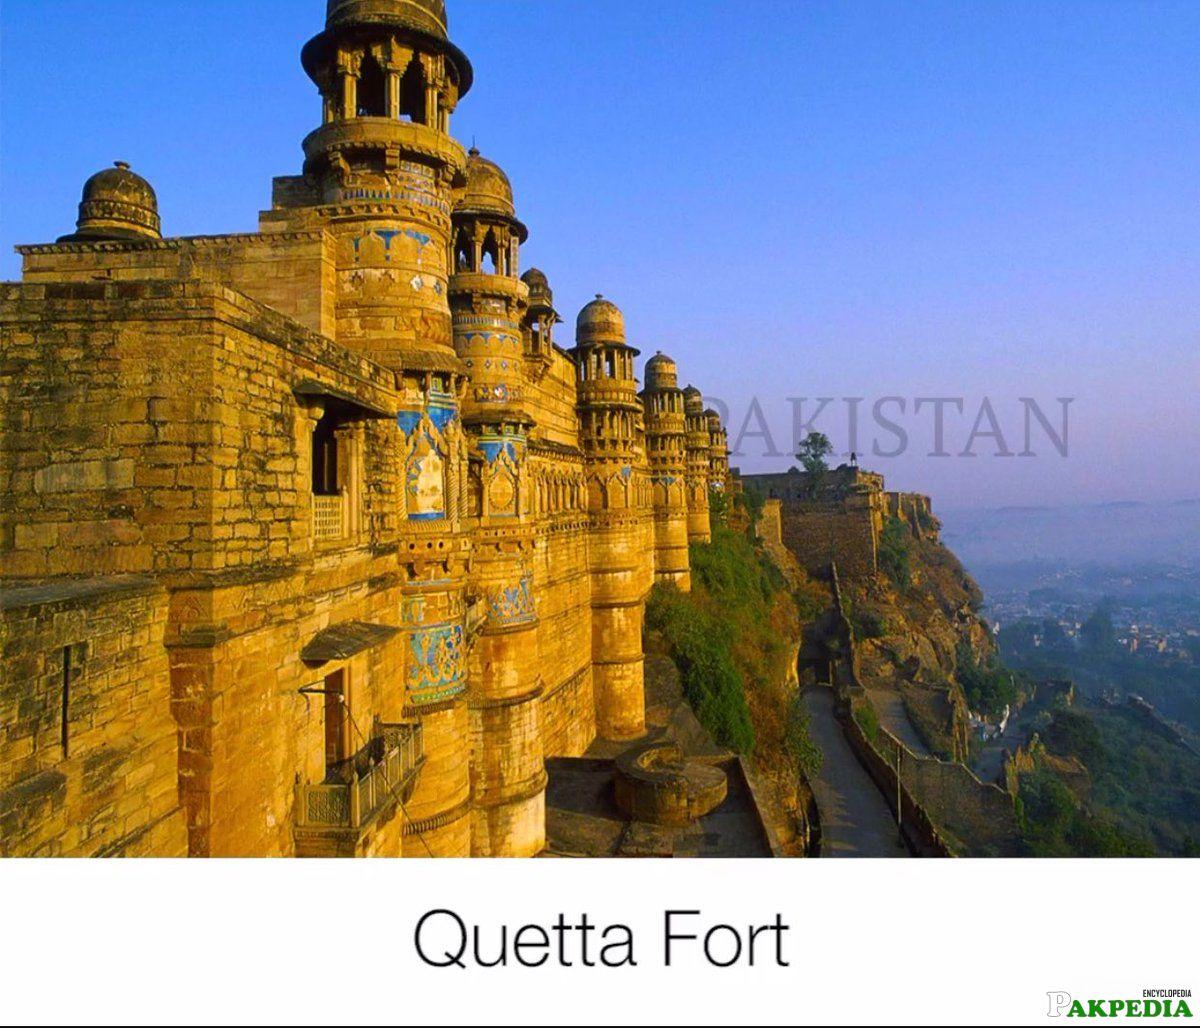 Quetta Fort